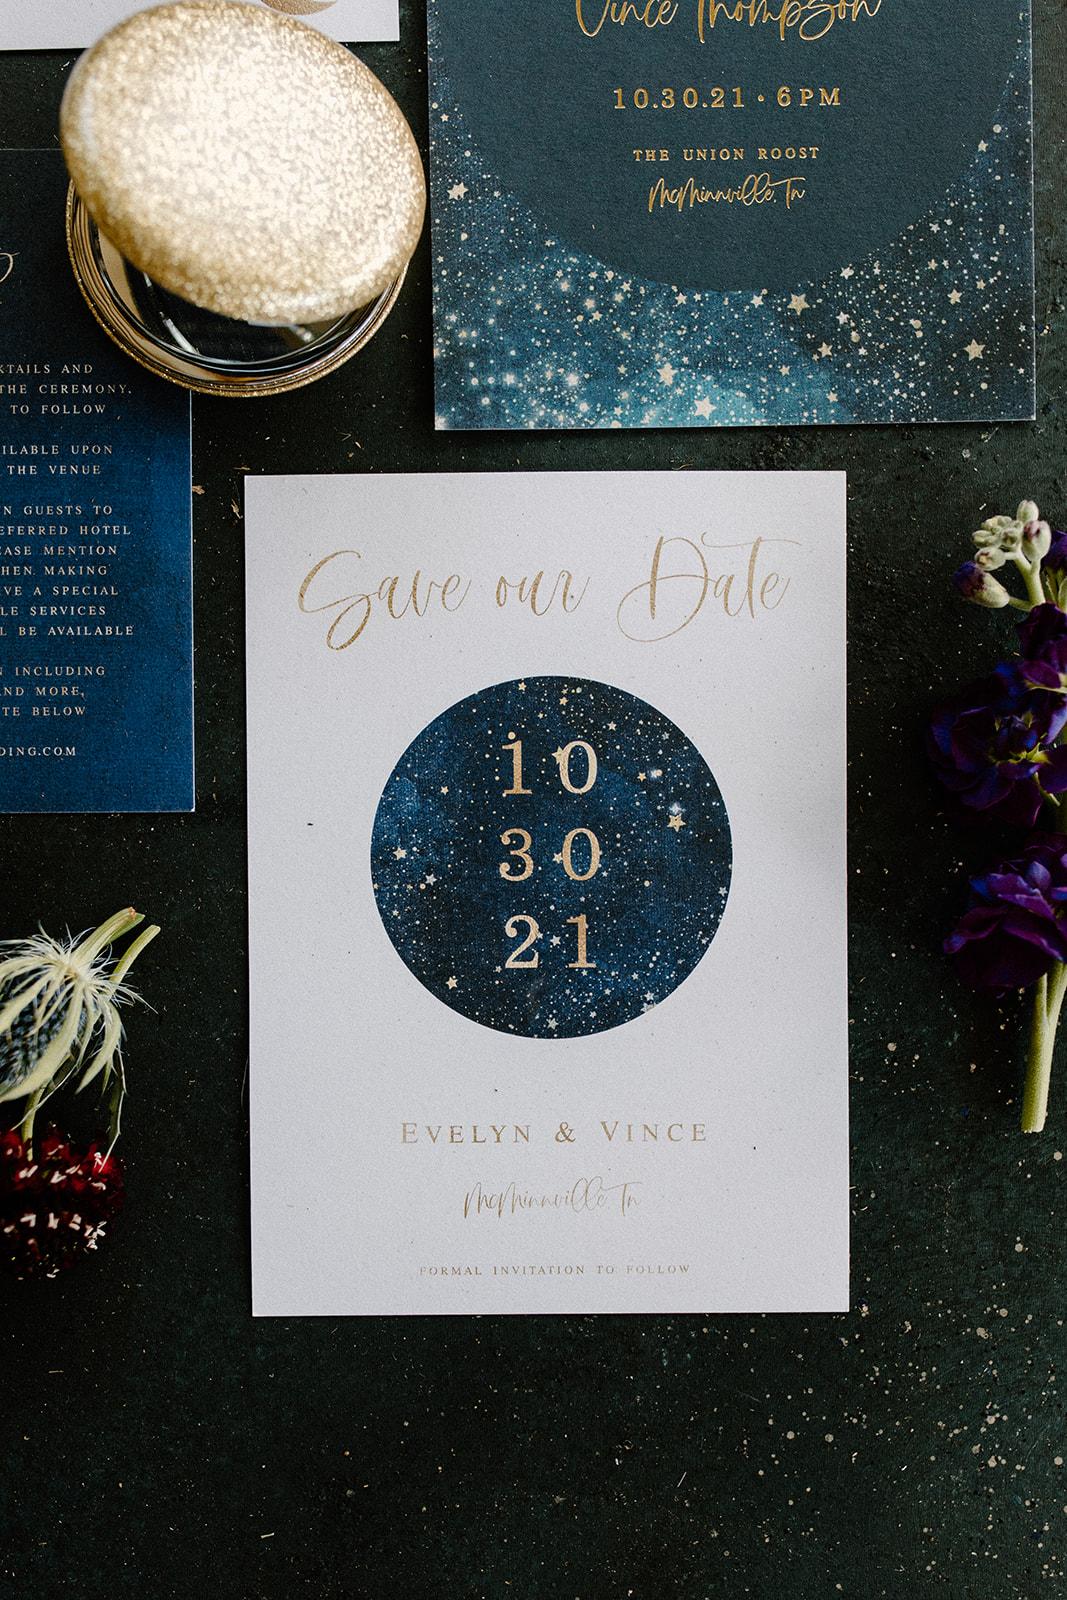 Celestial wedding save the dates